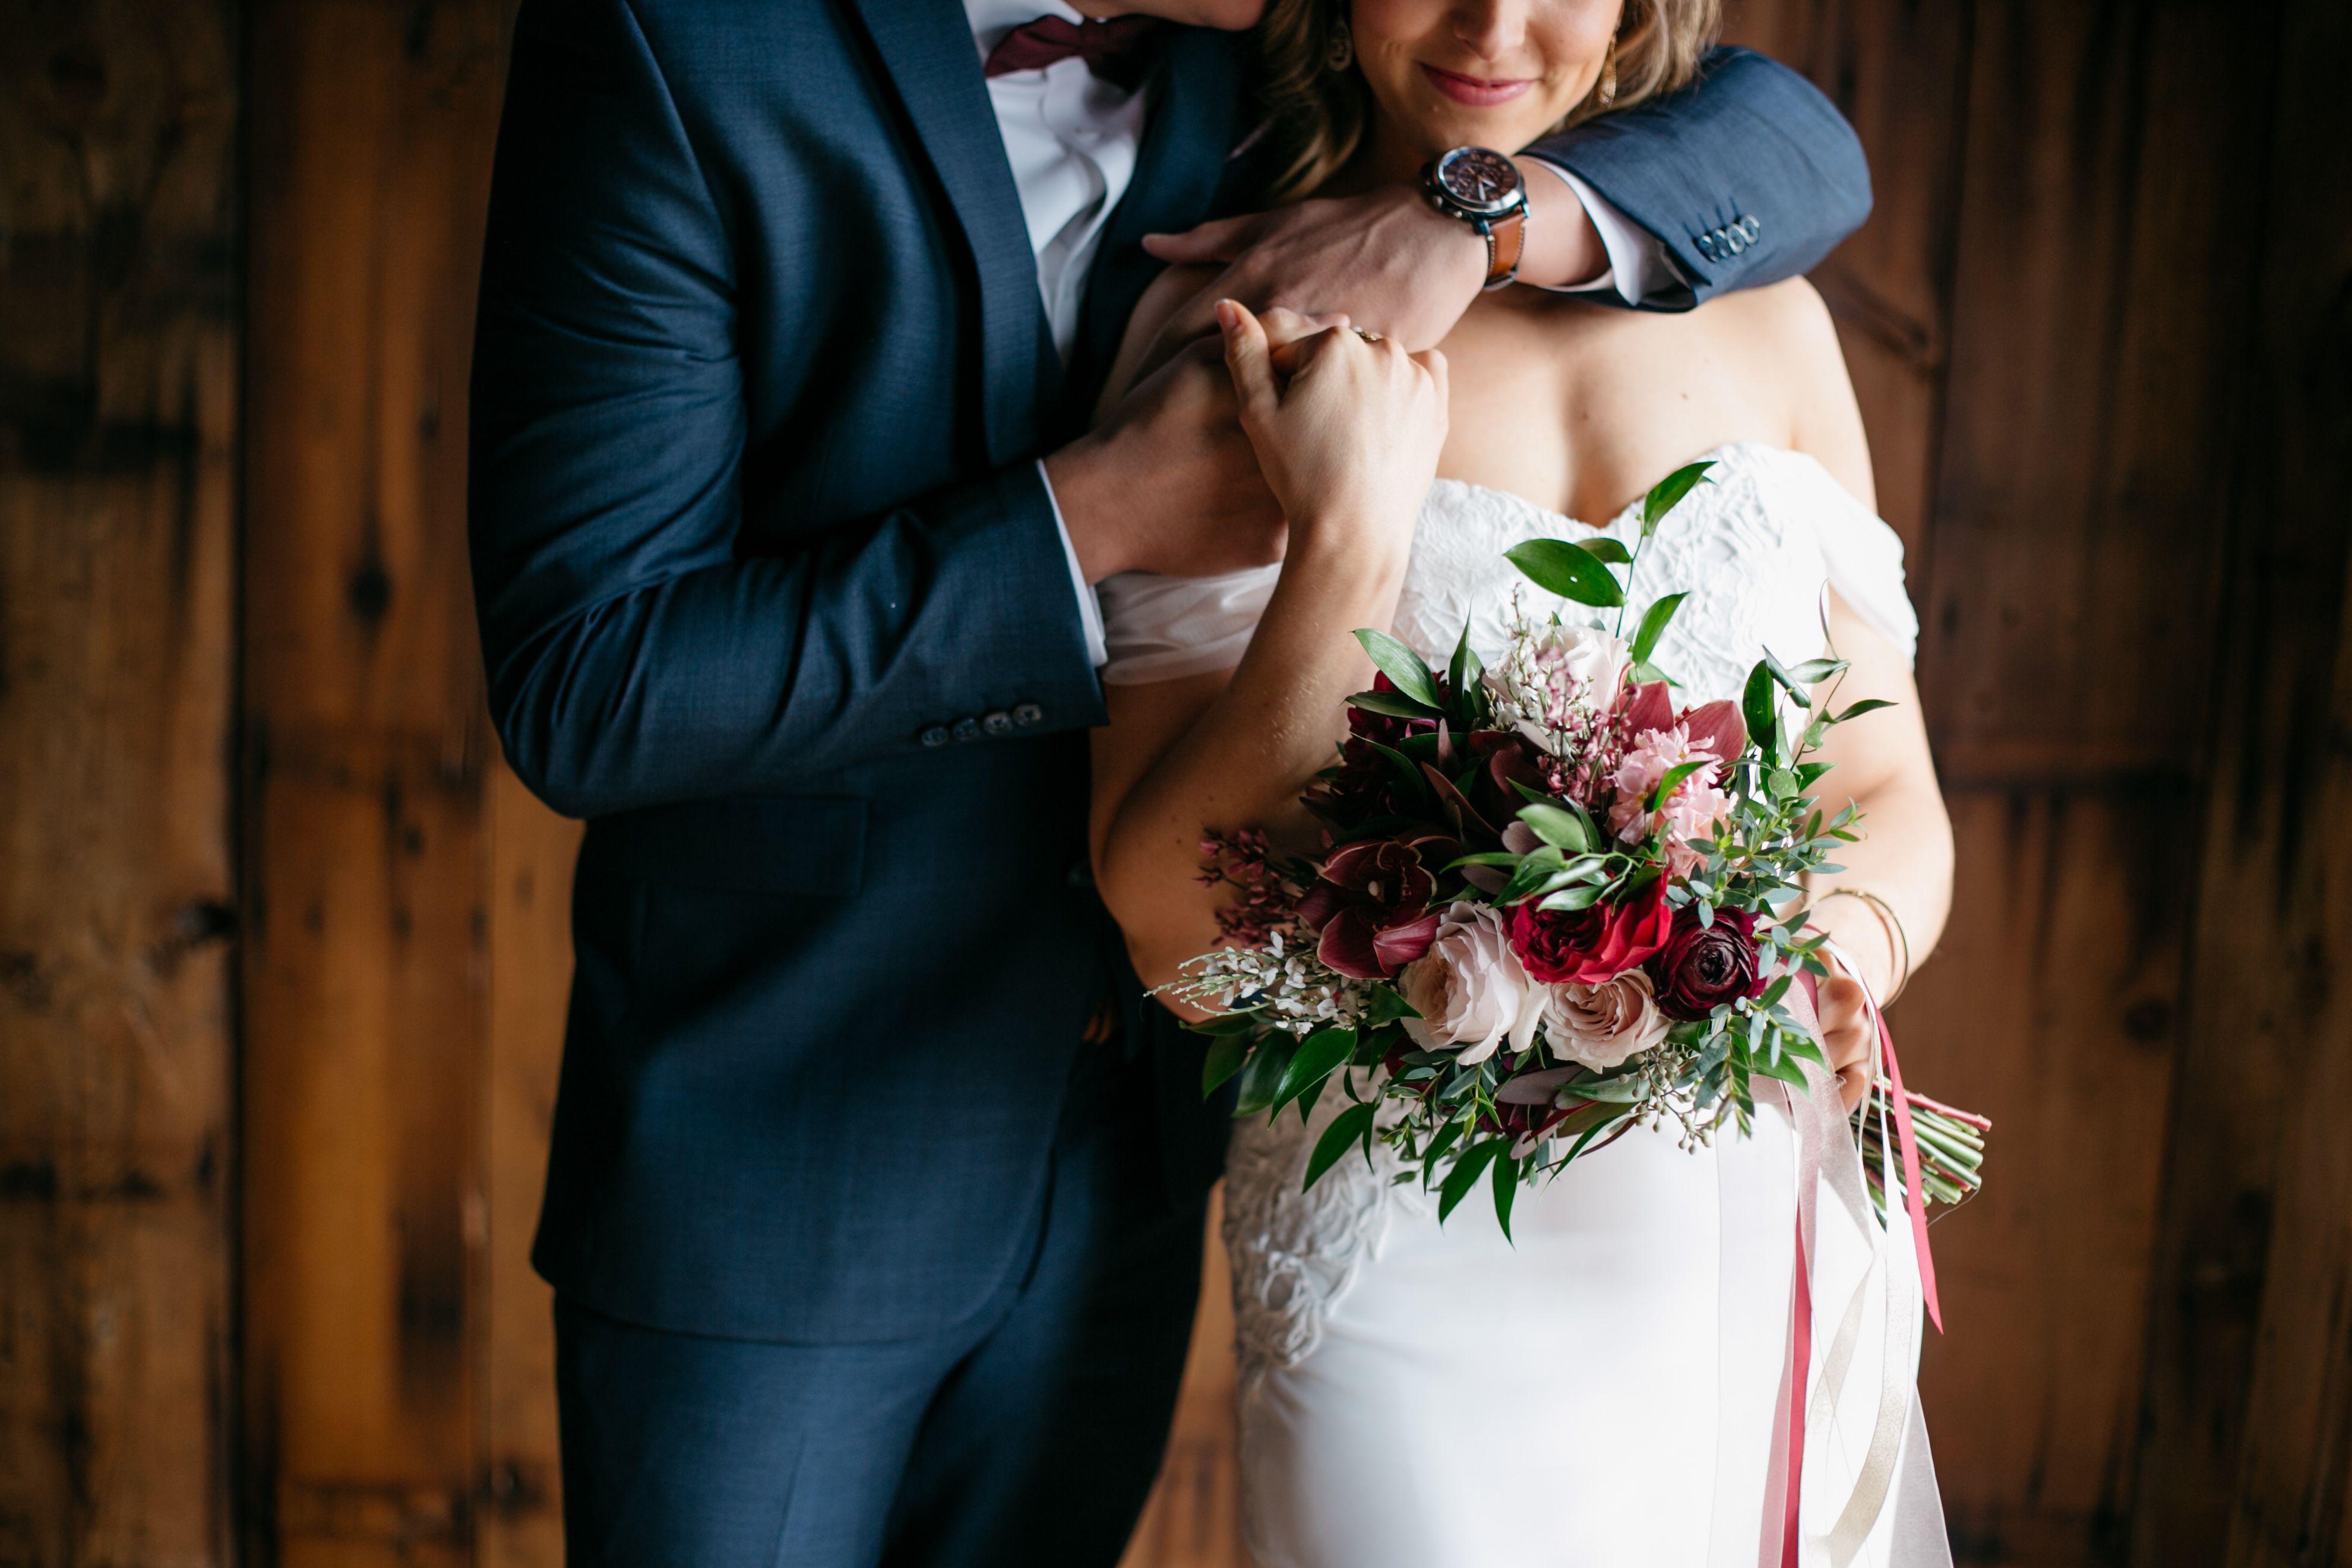 Alterations 5 stars near me Wedding dresses, Dresses